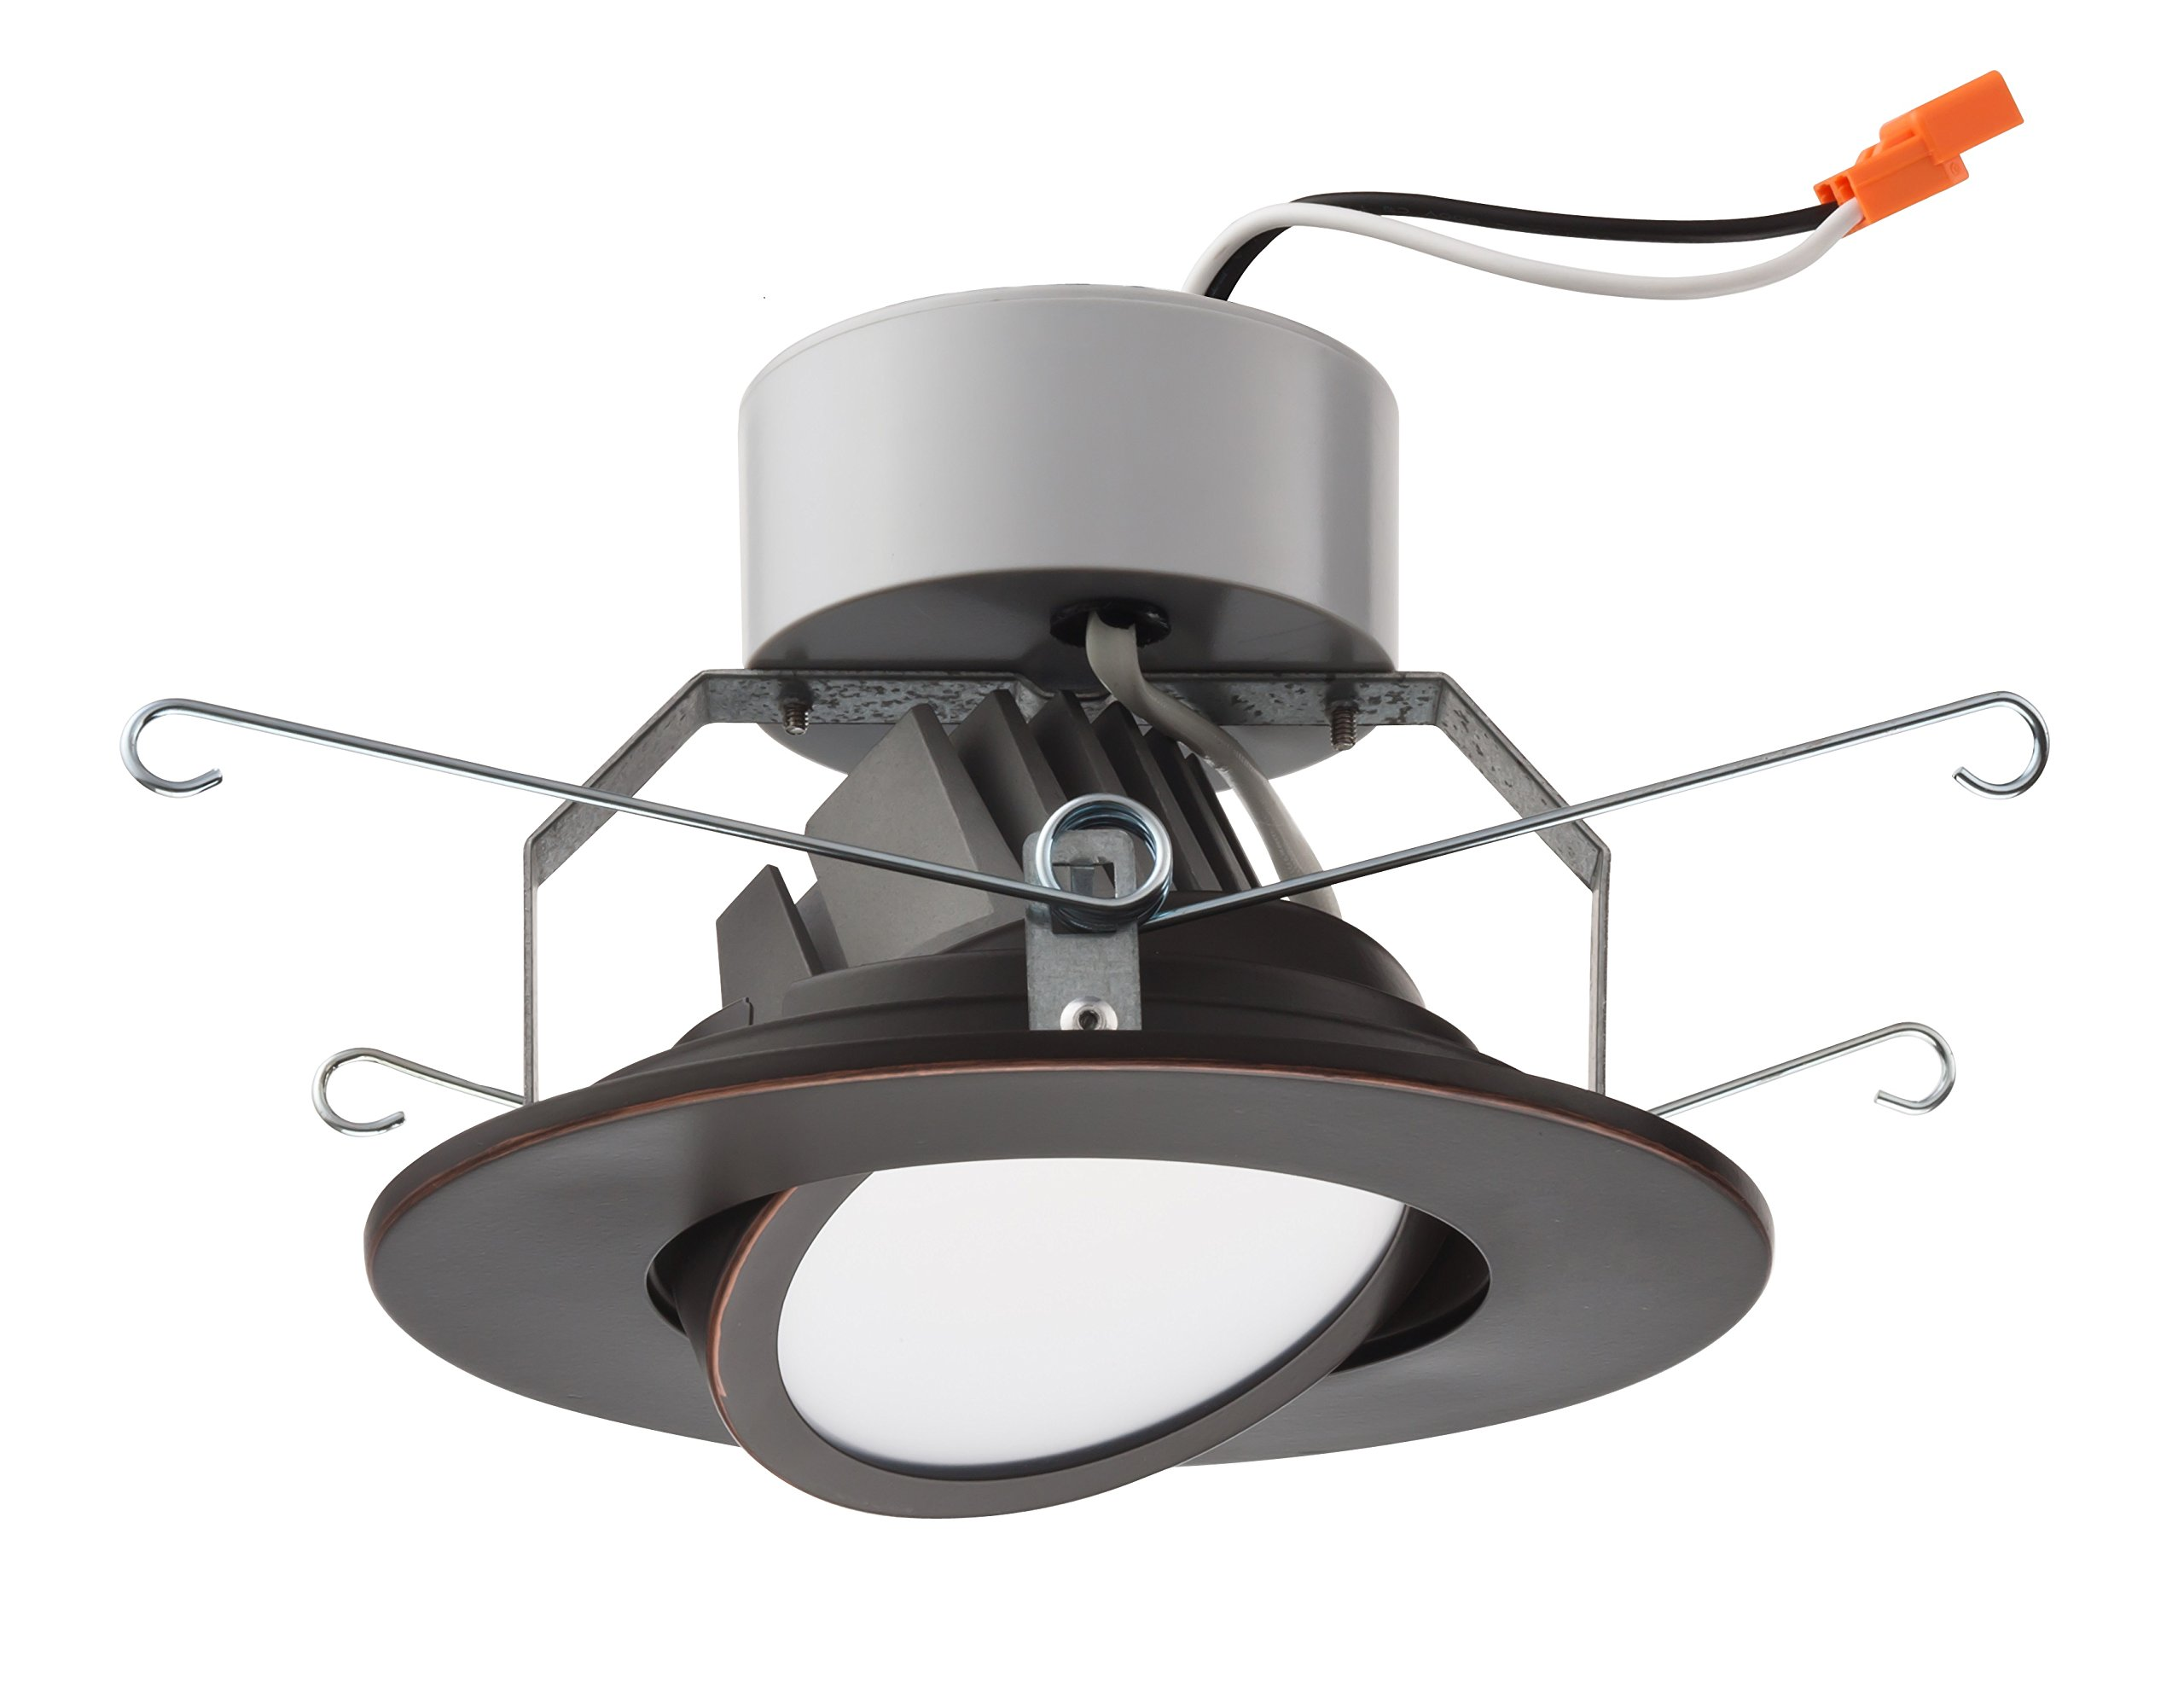 Lithonia Lighting 5 Inch LED Gimbal, Oil Rubbed Bronze, Higher Lumen Version